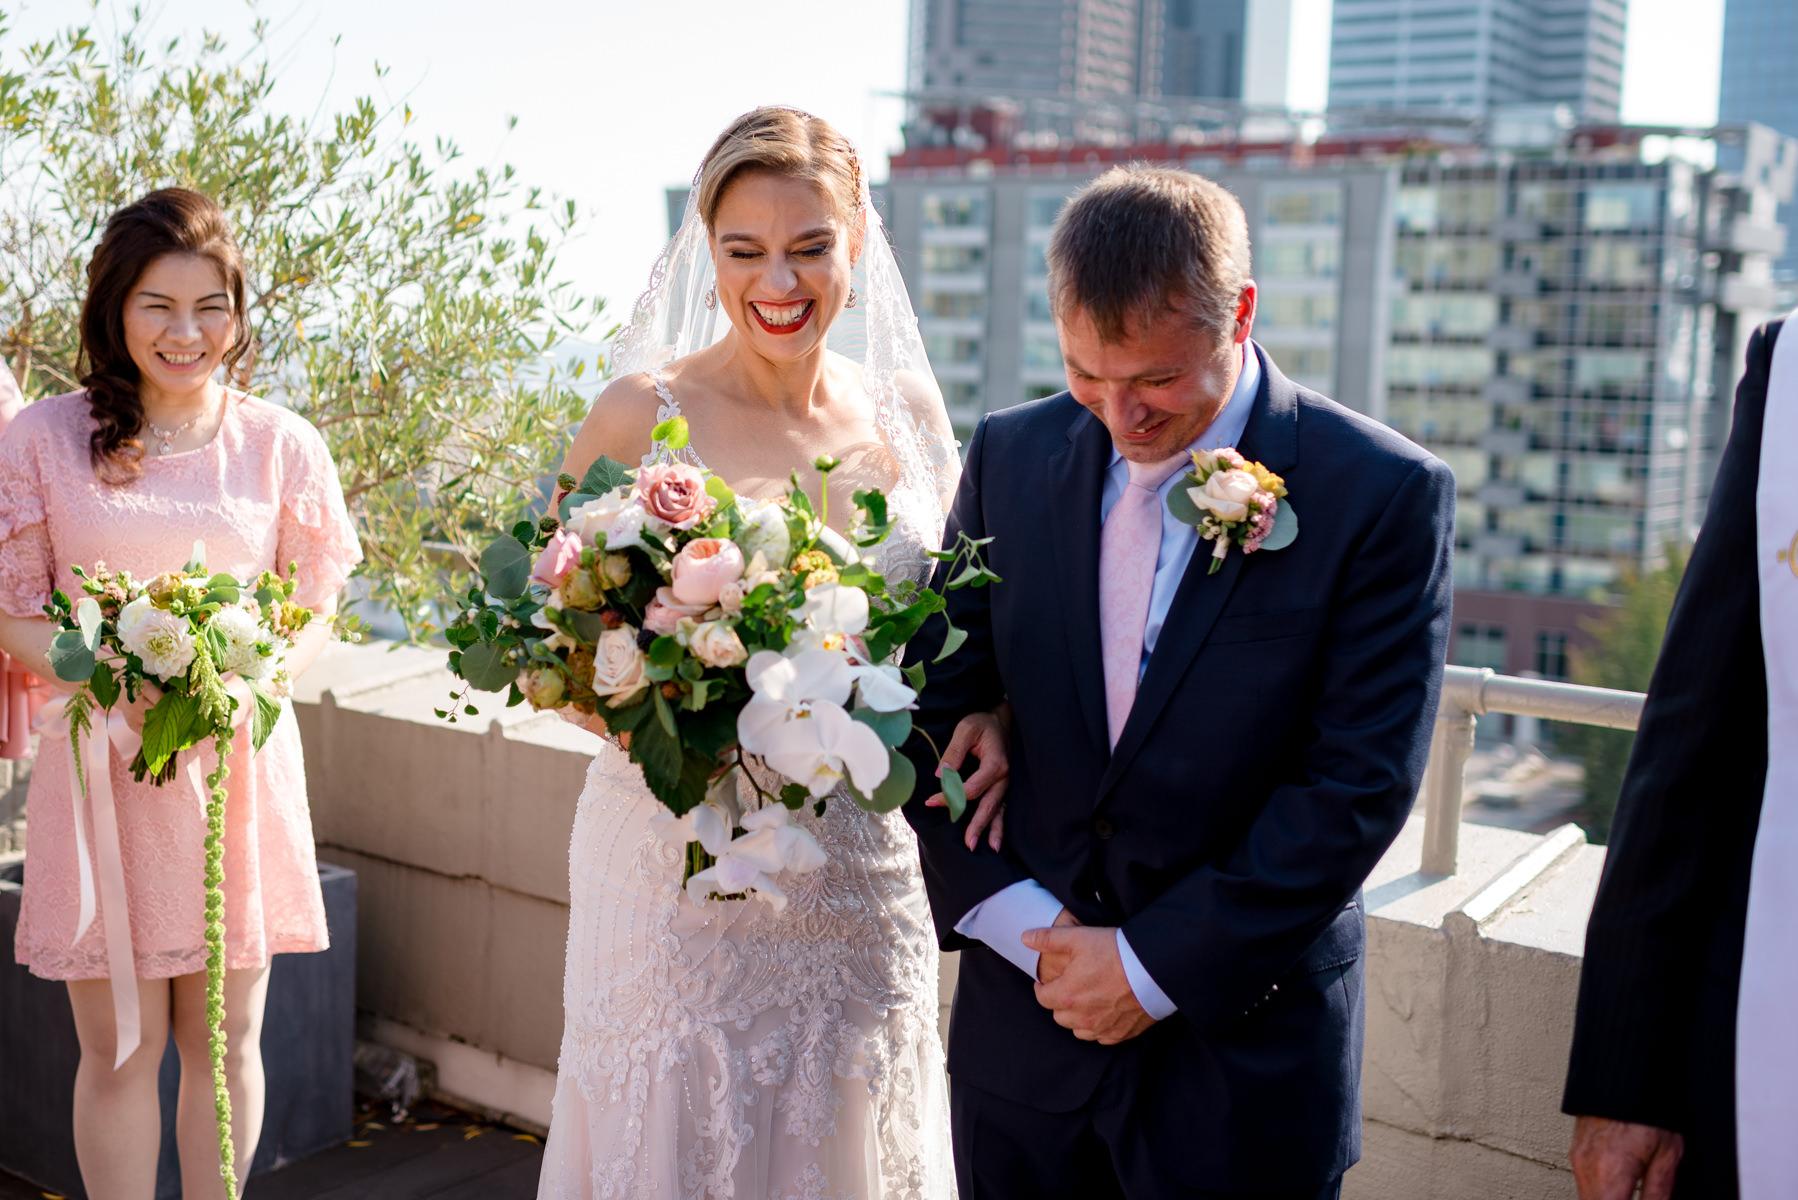 Andrew Tat - Documentary Wedding Photography - Hotel Sorrento - Seattle, Washington -Jessica & Paul - 19.jpg